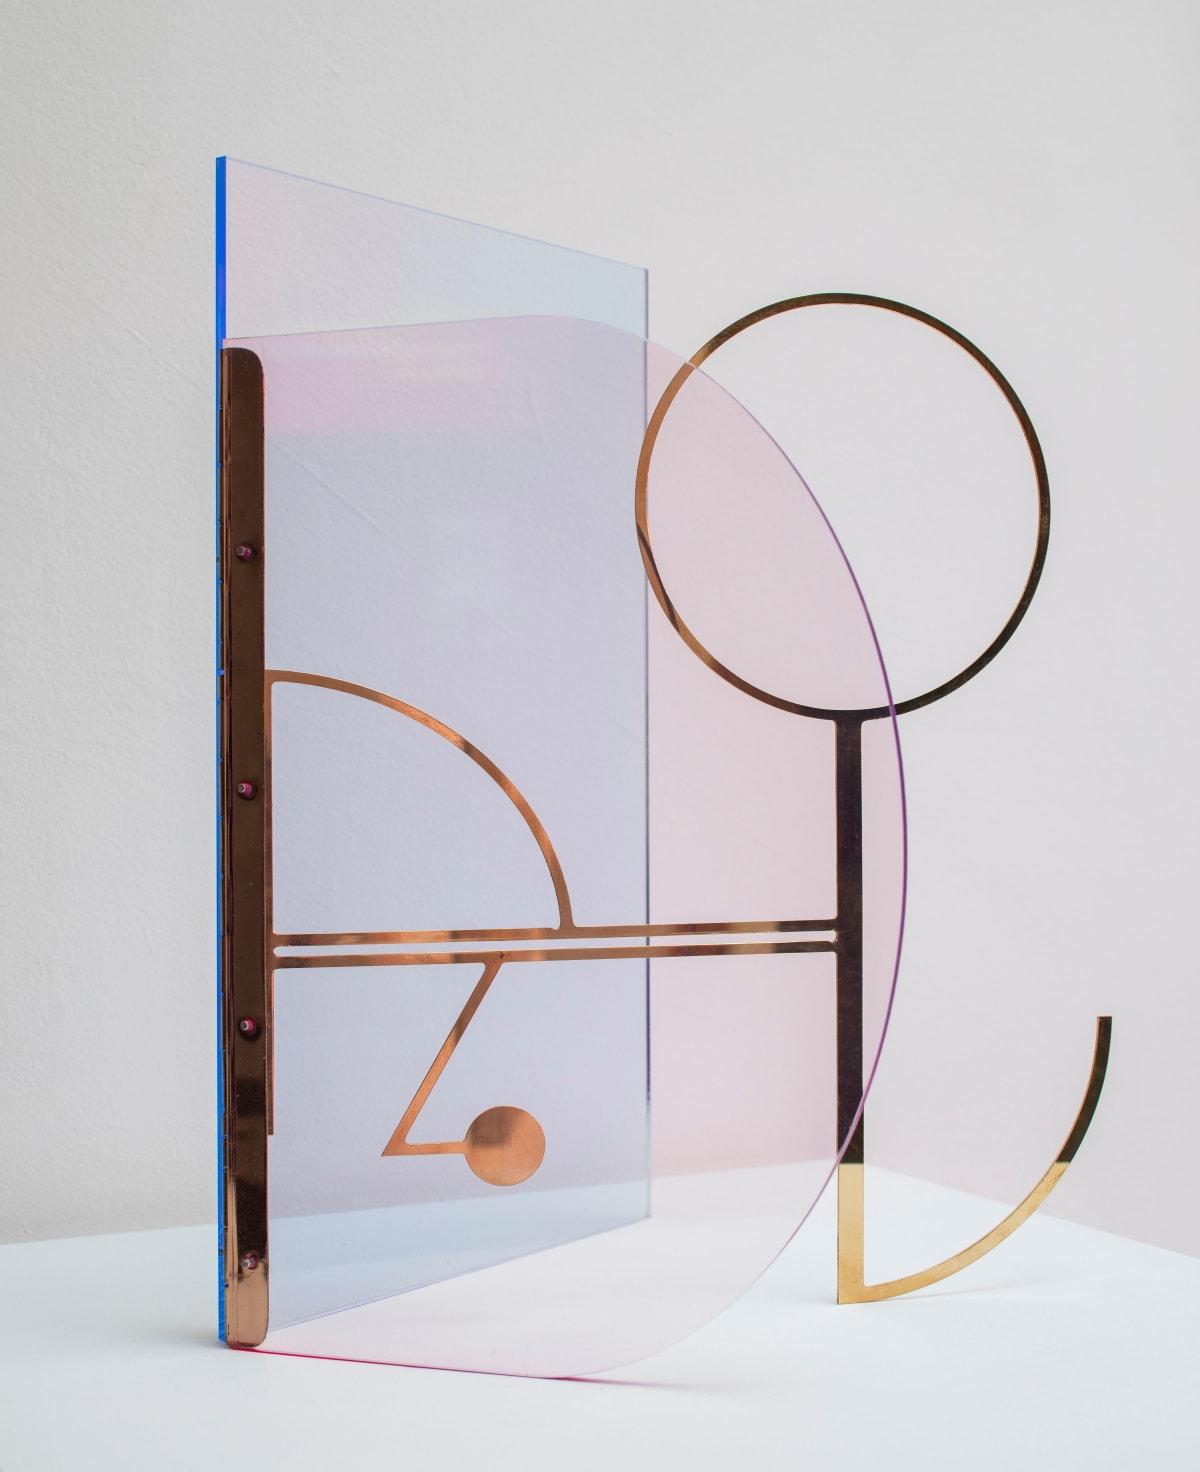 Sinta Tantra, Follow Constellations and Star Paths (Buckminster Fuller)